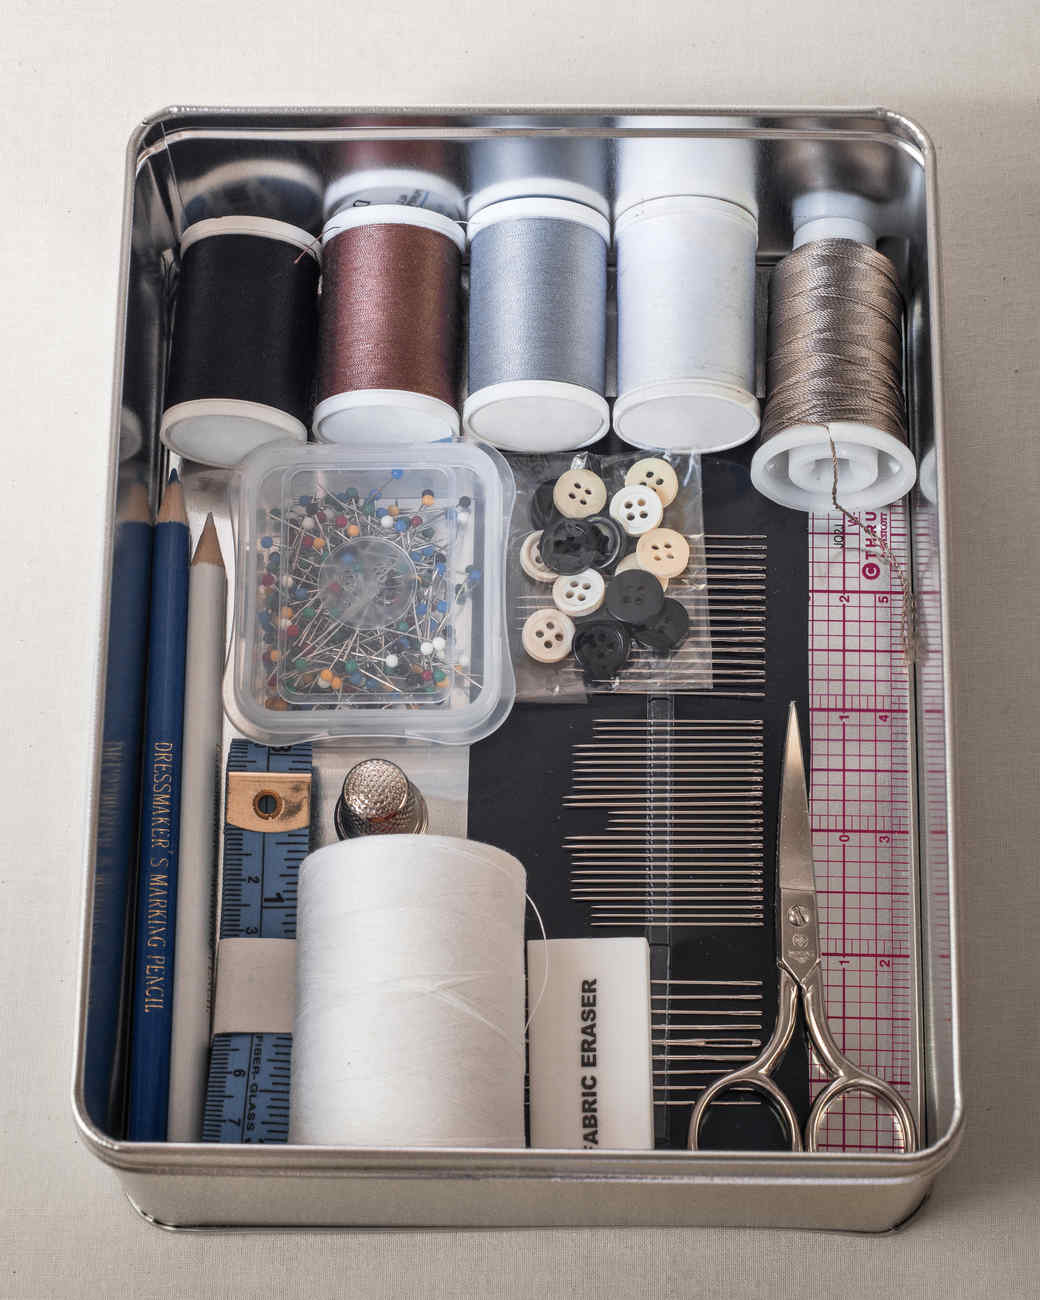 laundry-room-247-md110733.jpg